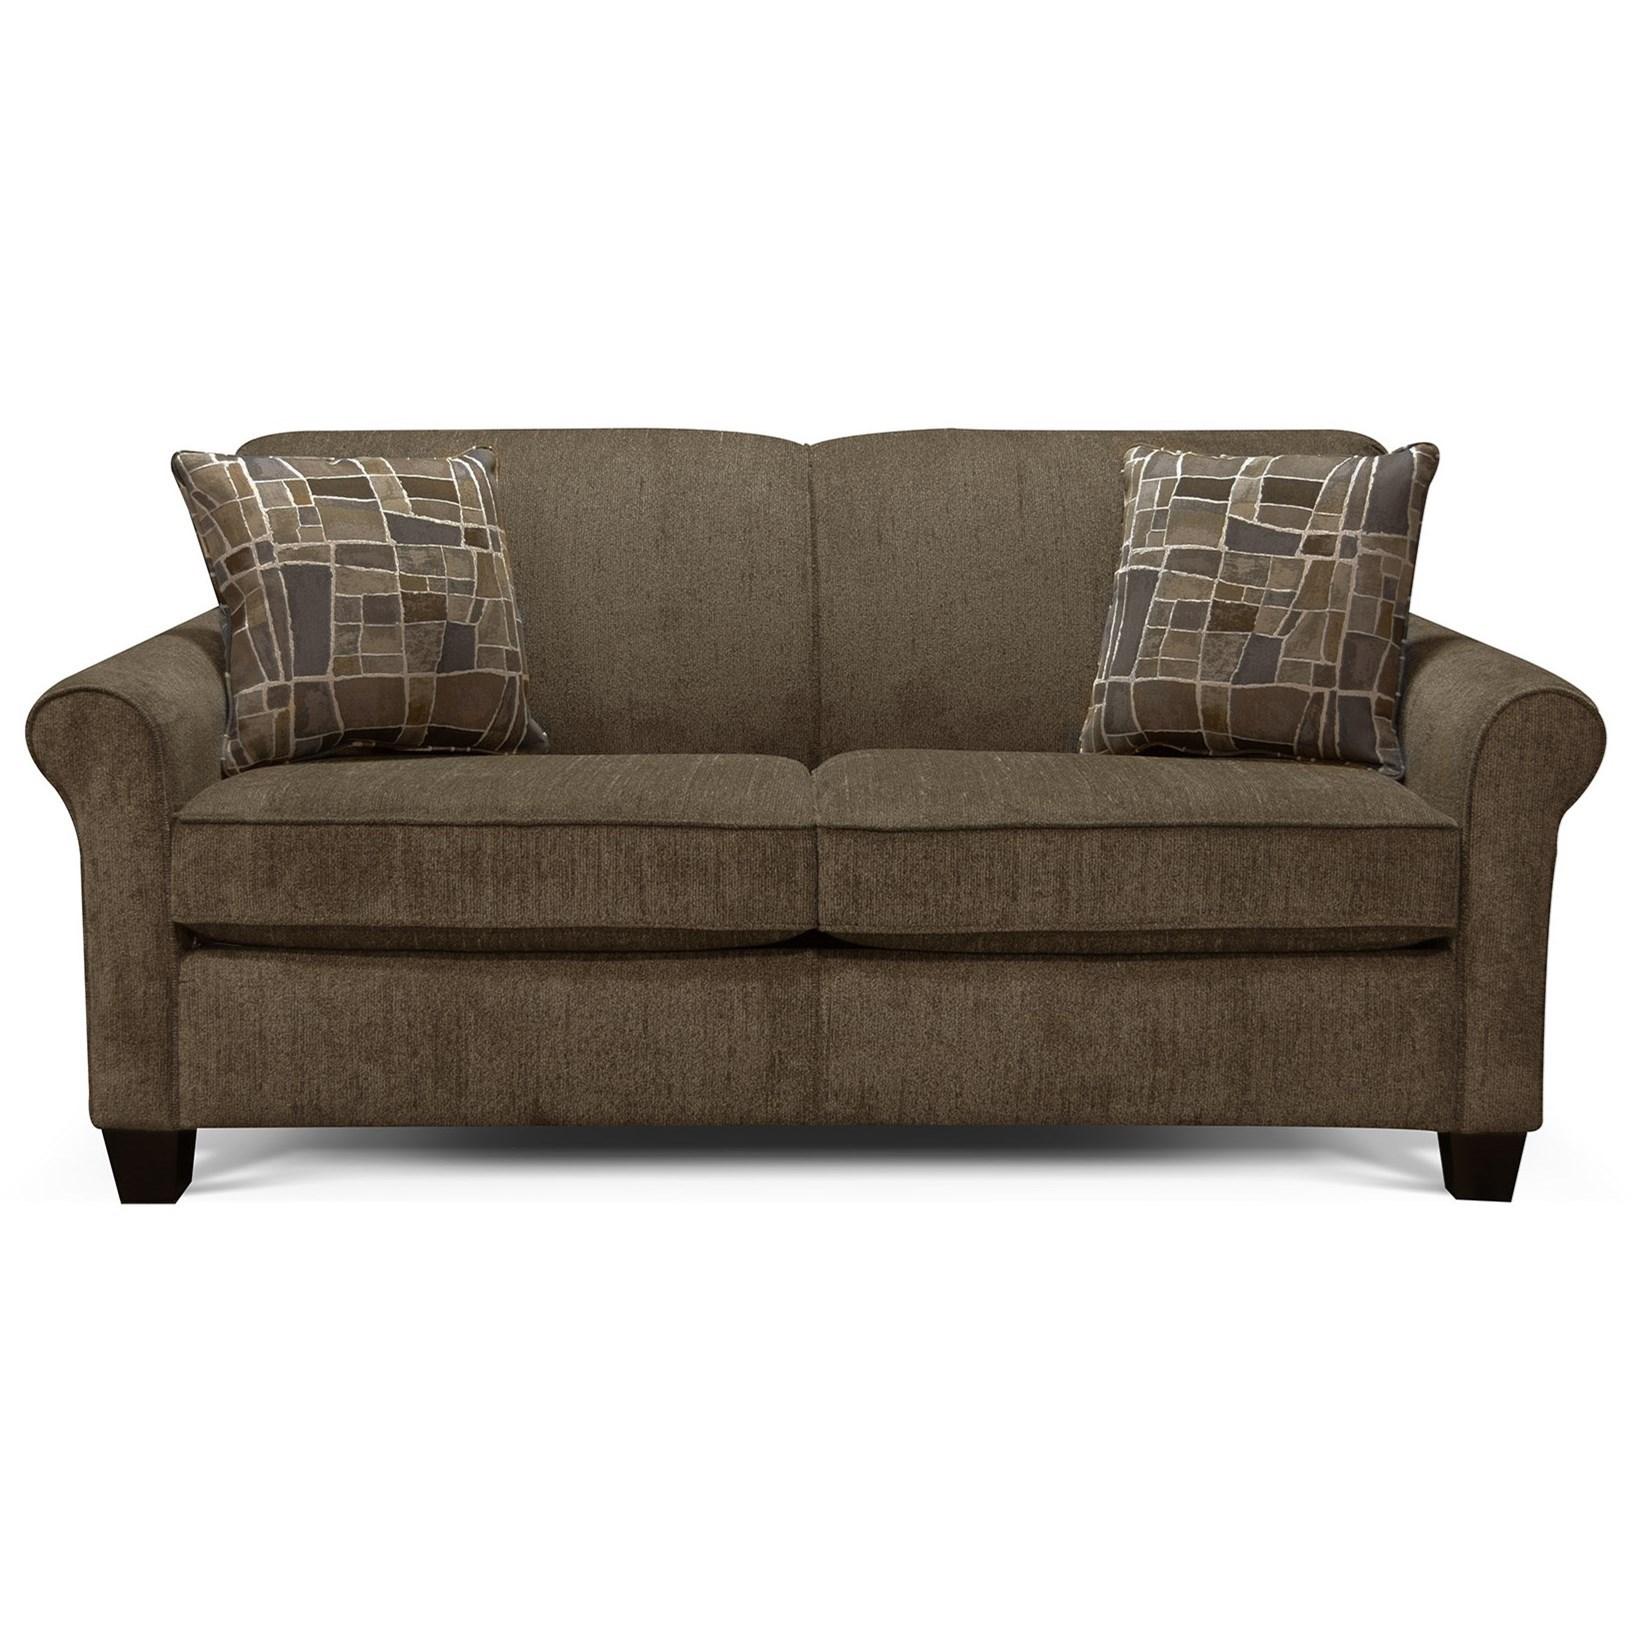 Angie  Full Sleeper Sofa by England at Novello Home Furnishings